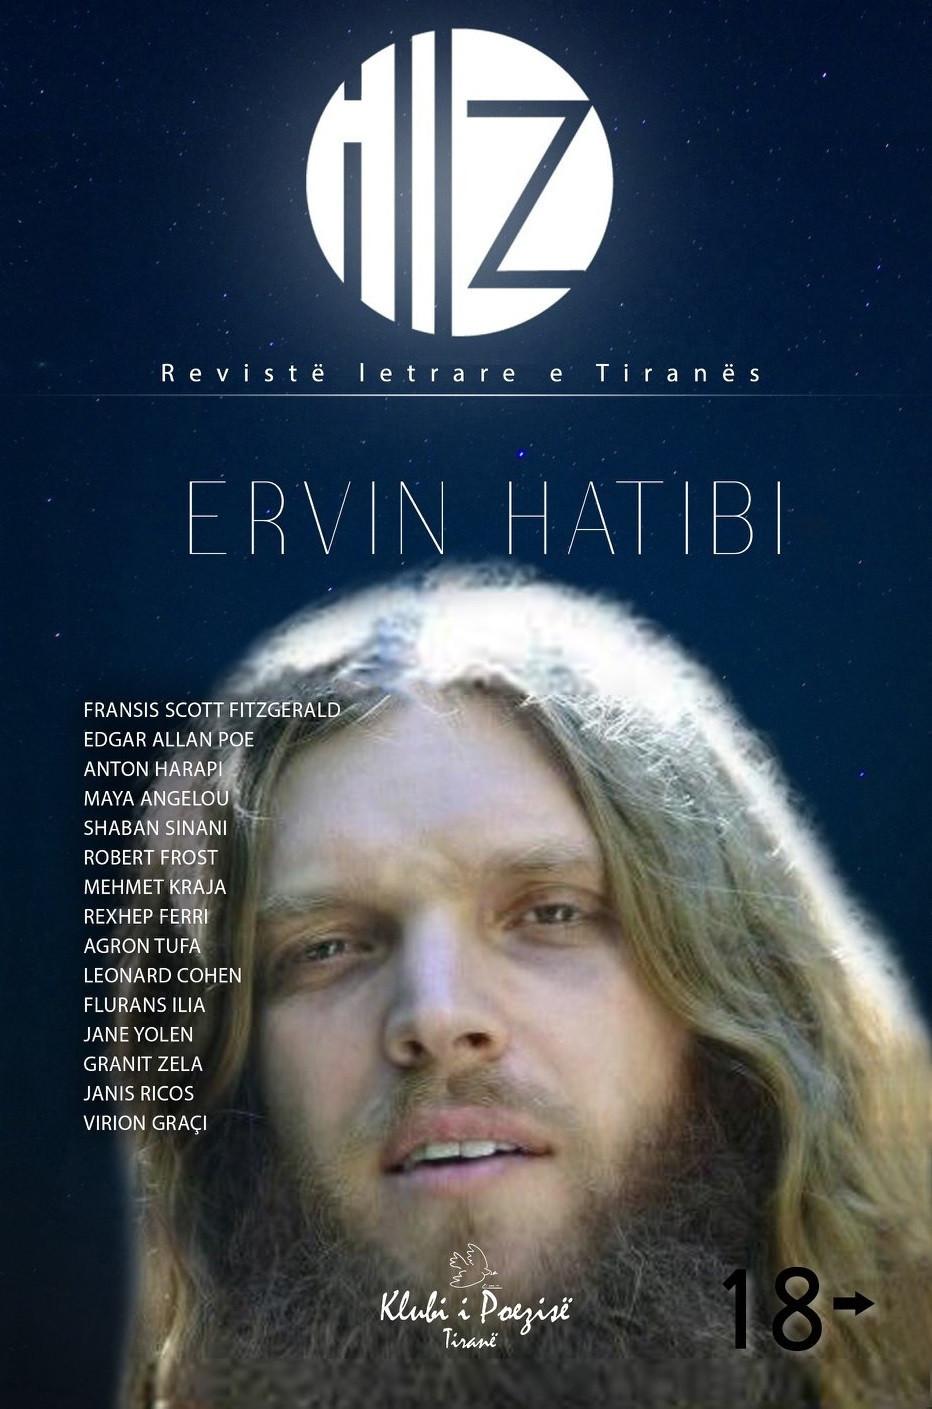 Revista Illz, nr. 18